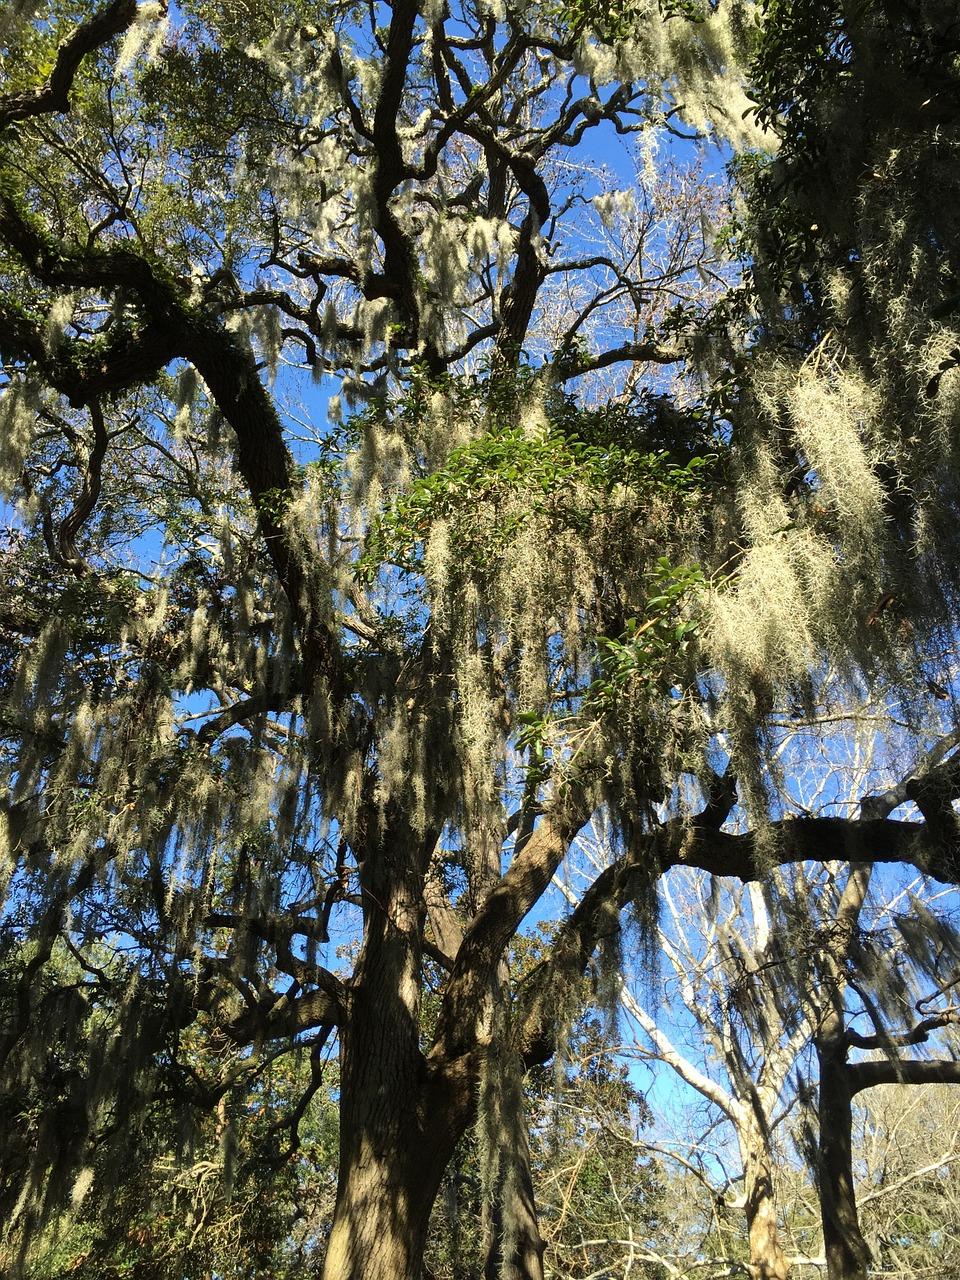 savannah-oaktree-moss